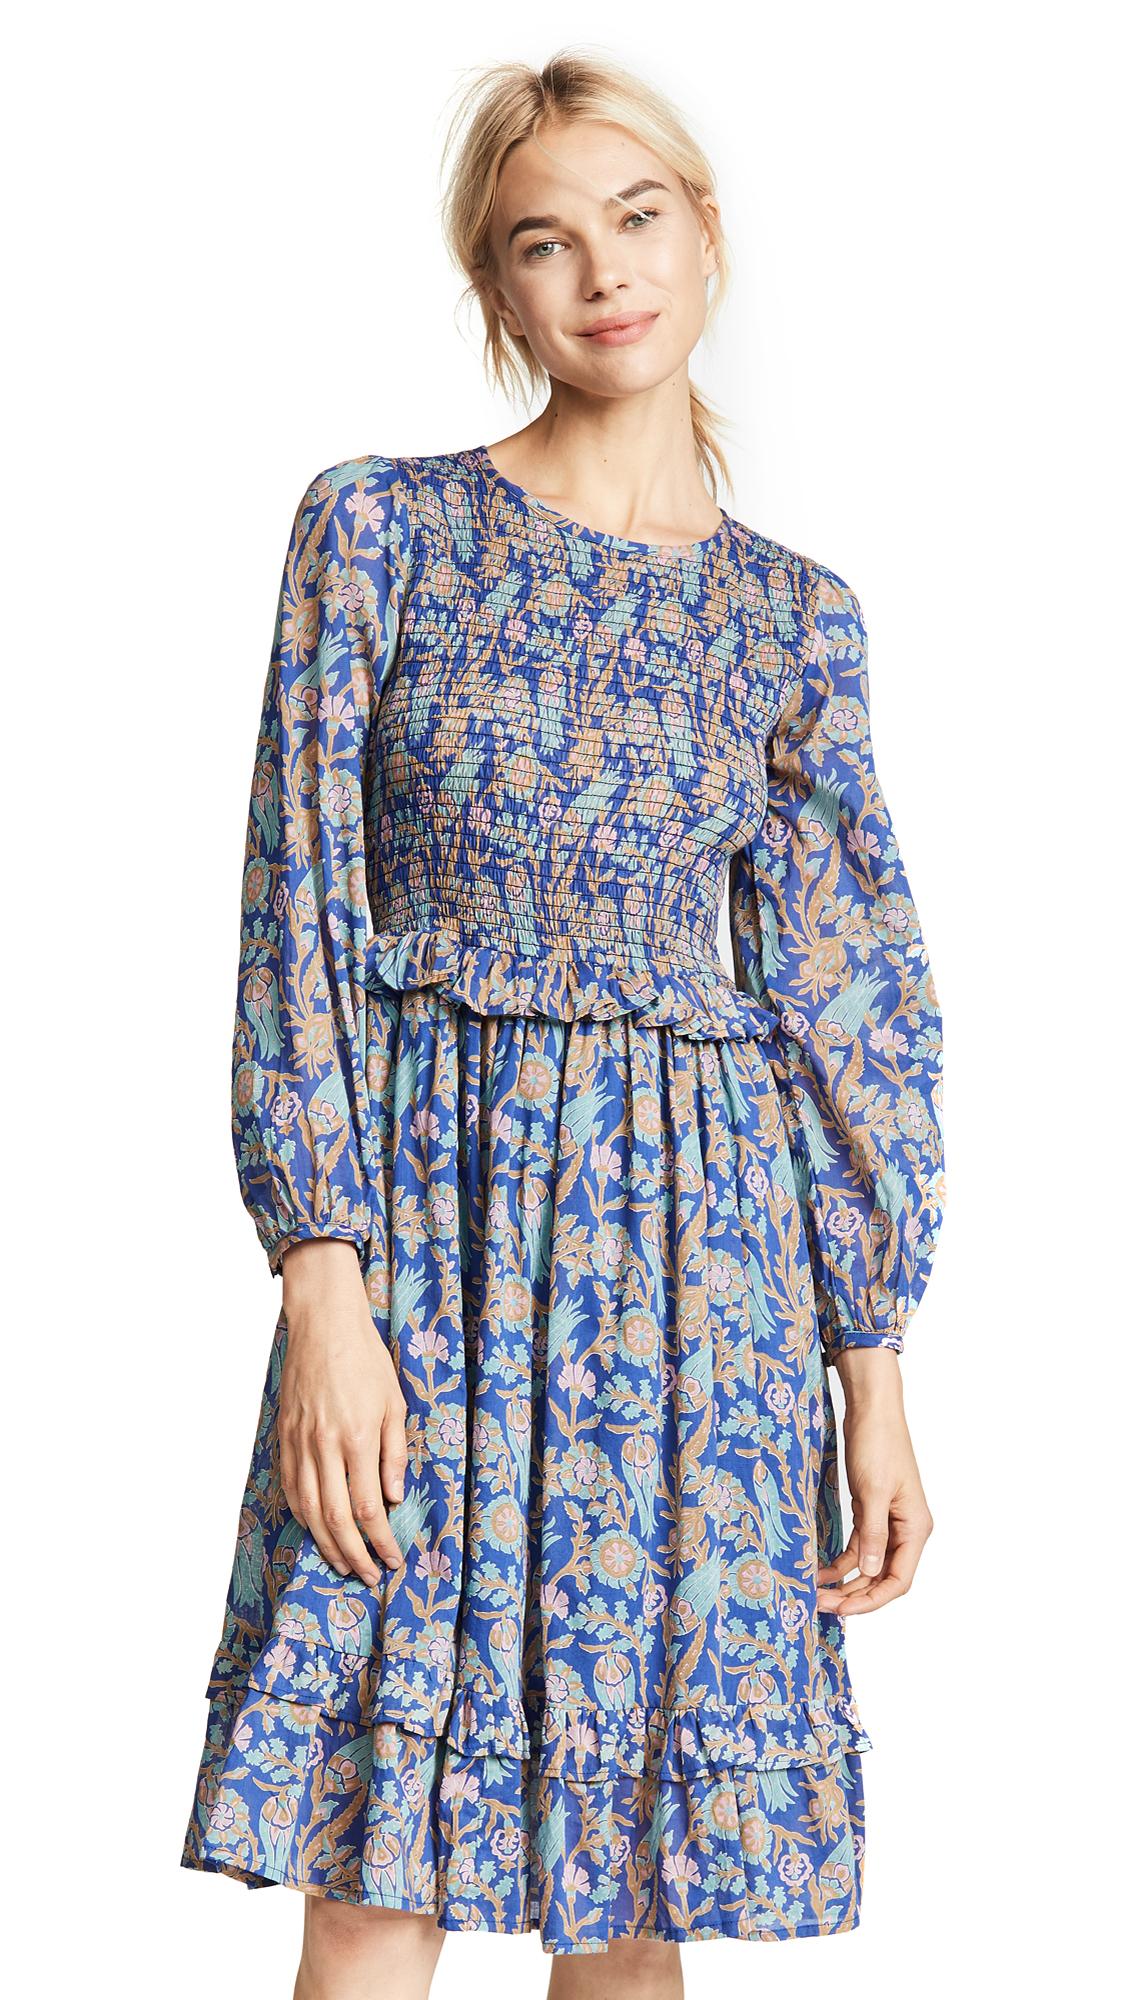 Banjanan Isadora Dress In Orient Flower Blueprint